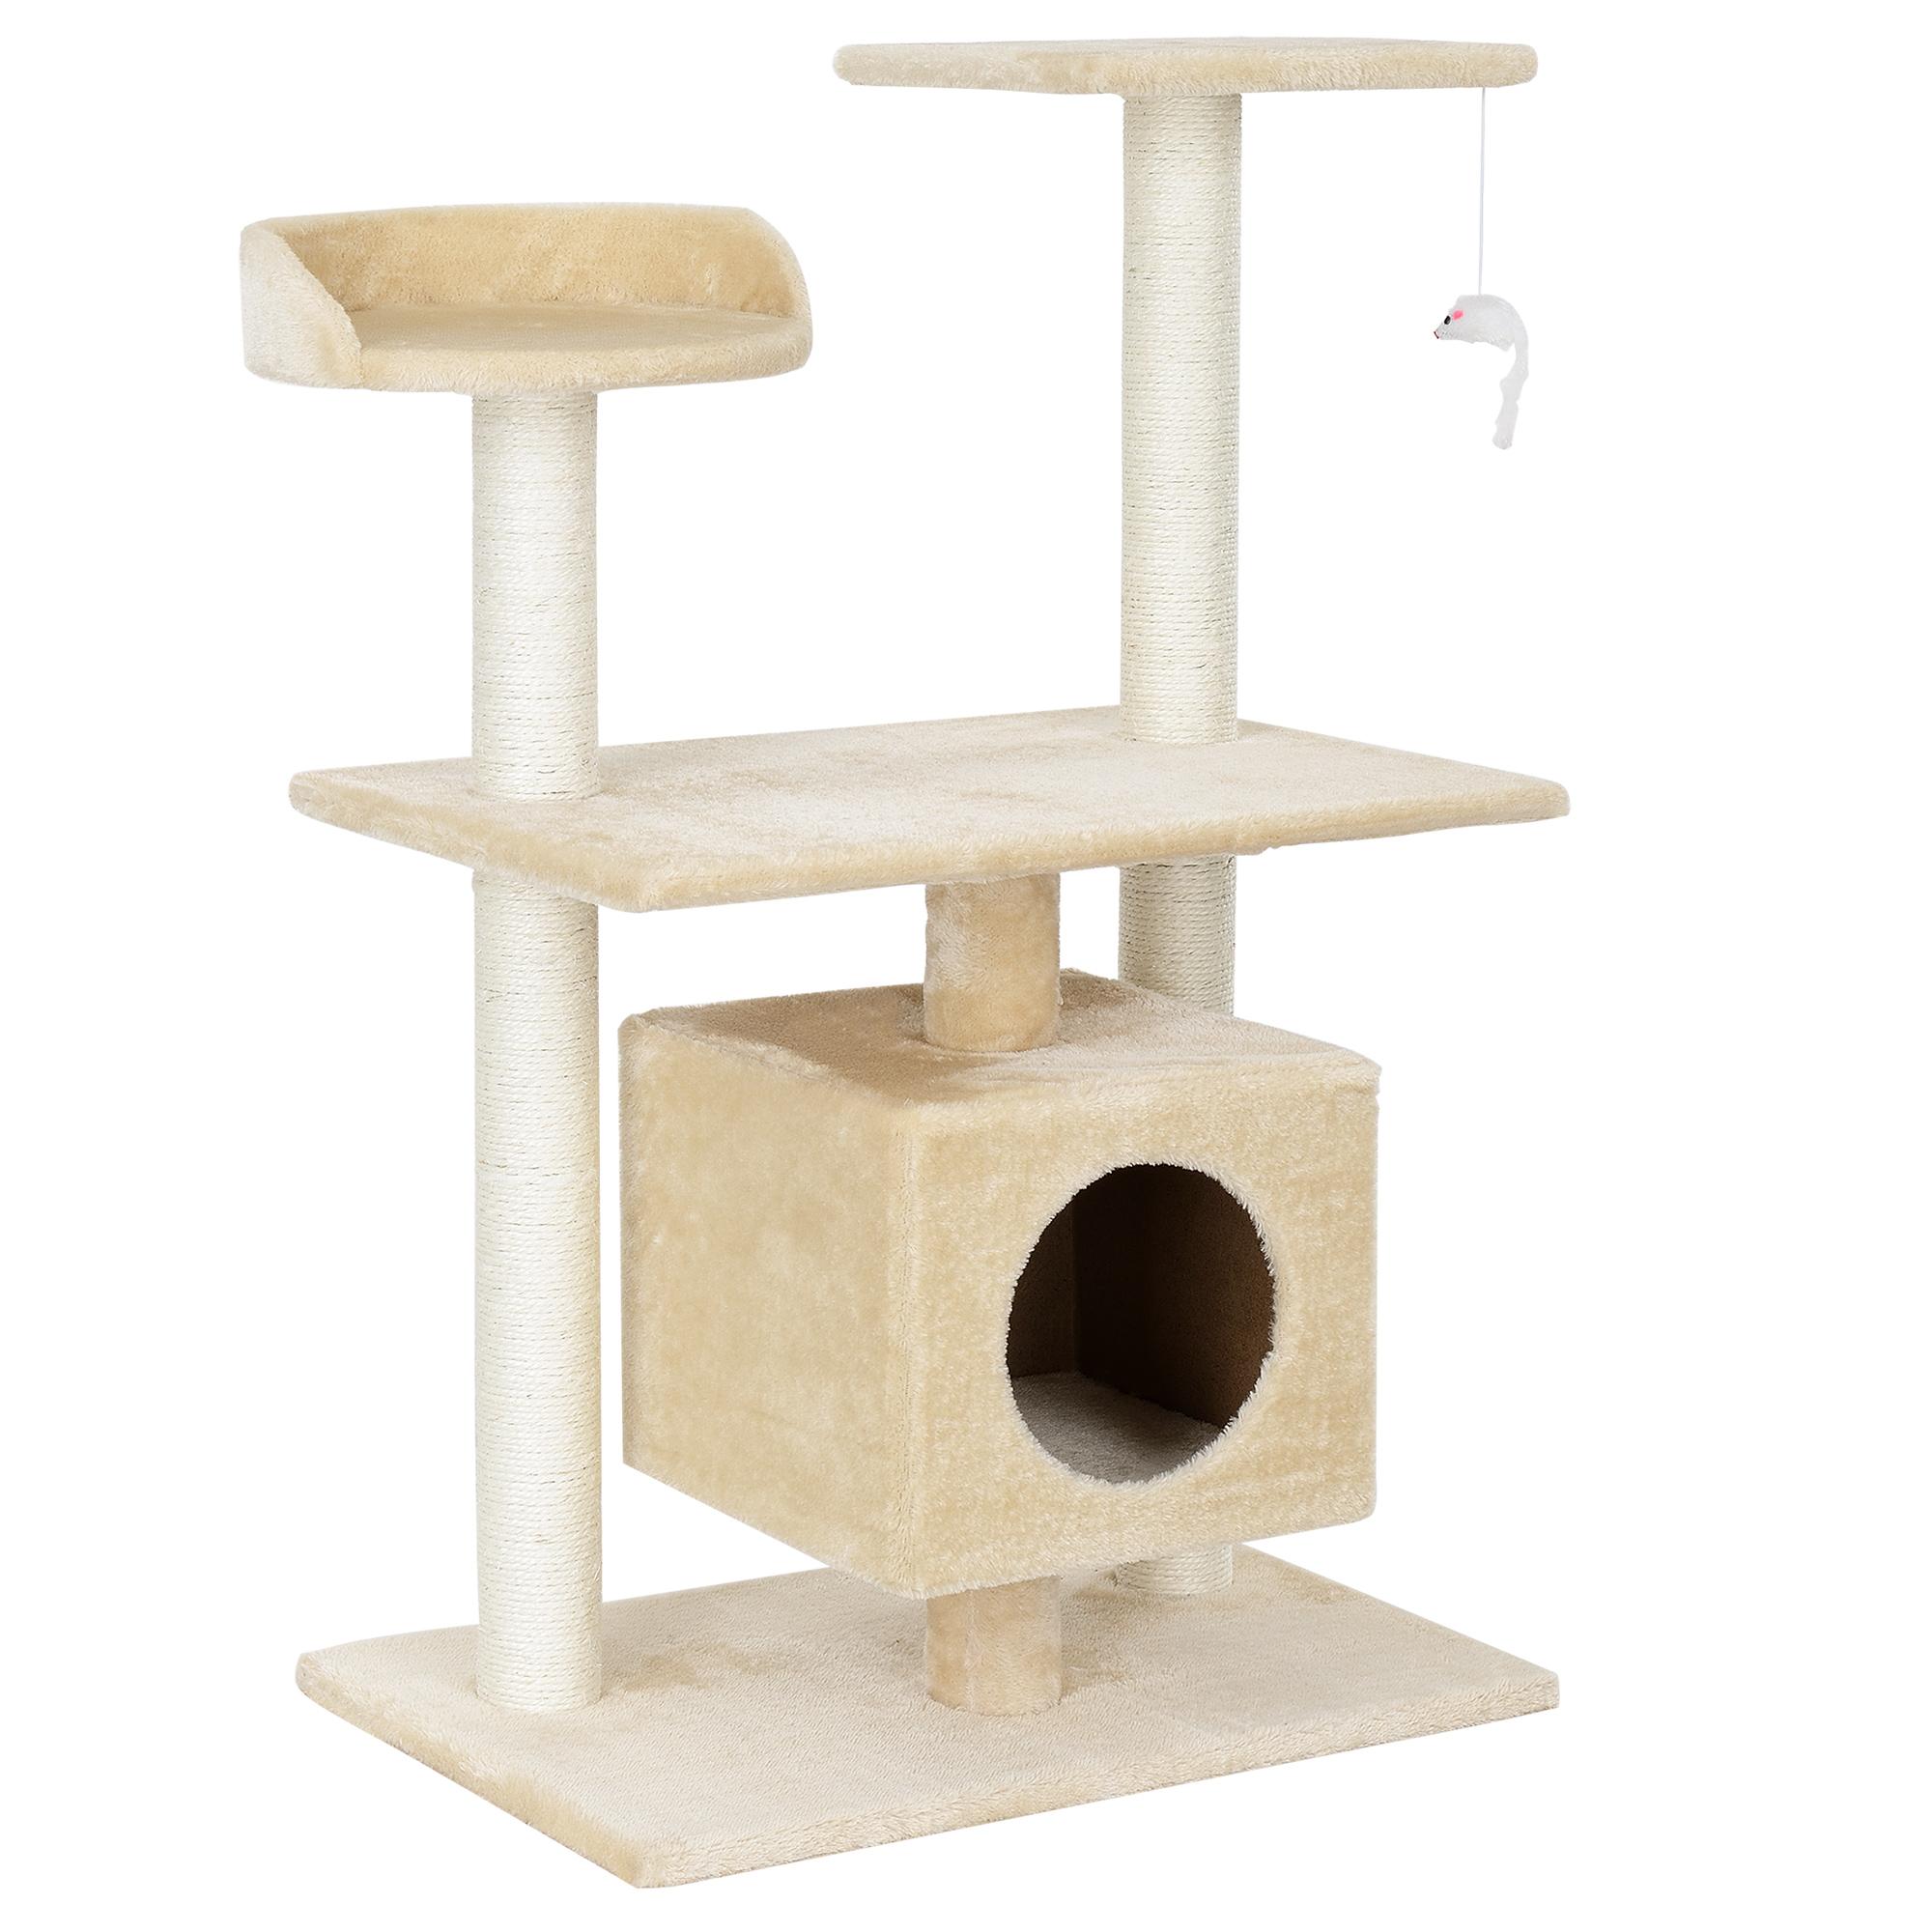 pro tec hundetransportbox xxl blau faltbar transportbox hunde box trage tasche ebay. Black Bedroom Furniture Sets. Home Design Ideas